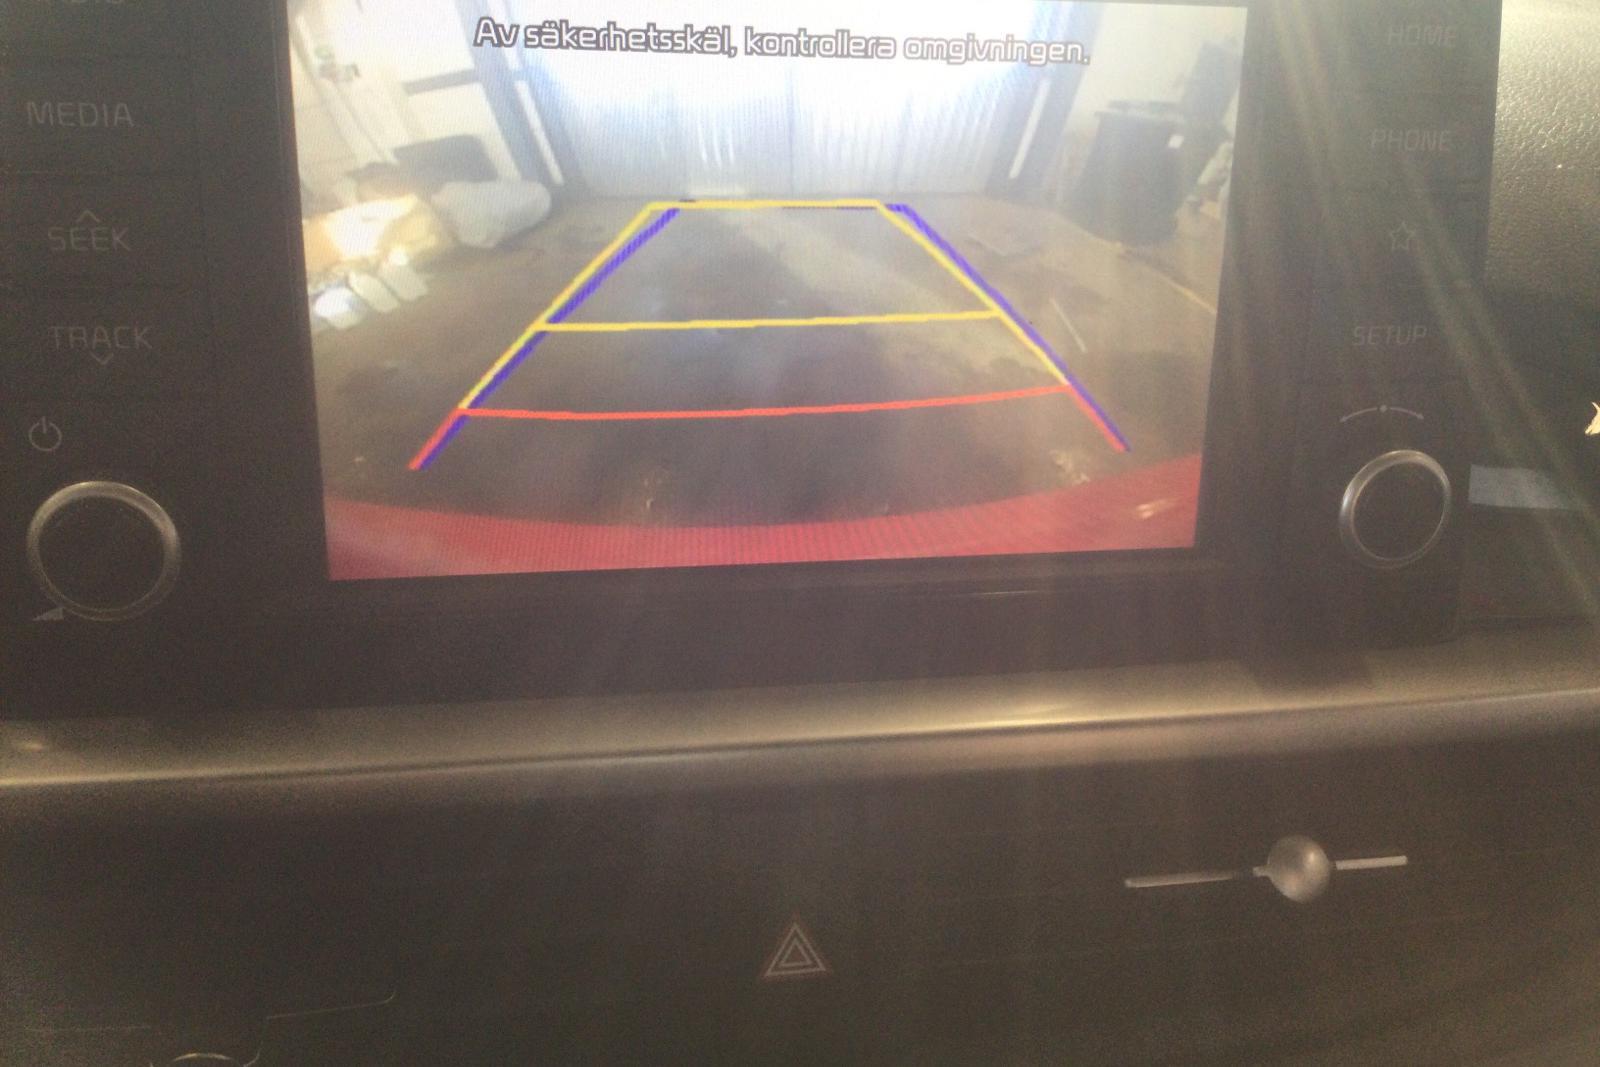 KIA Picanto 1.0 5dr (67hk) - 73 750 km - Manual - red - 2018